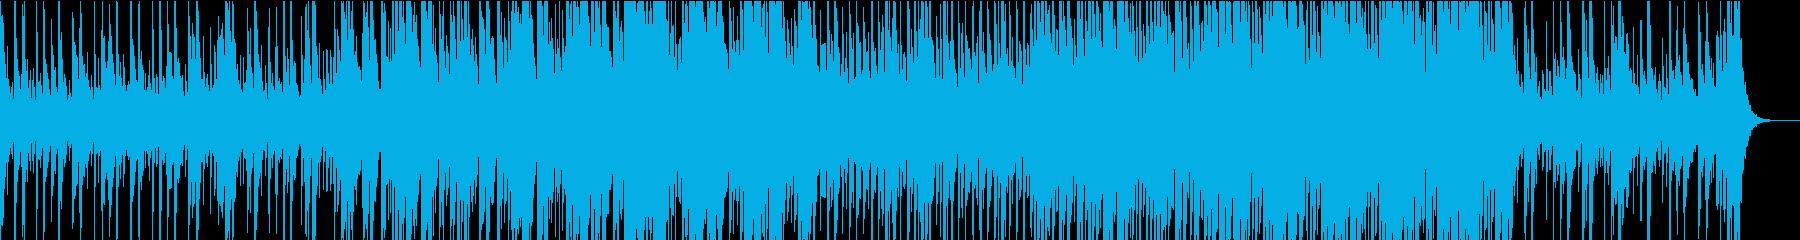 Drumsの再生済みの波形